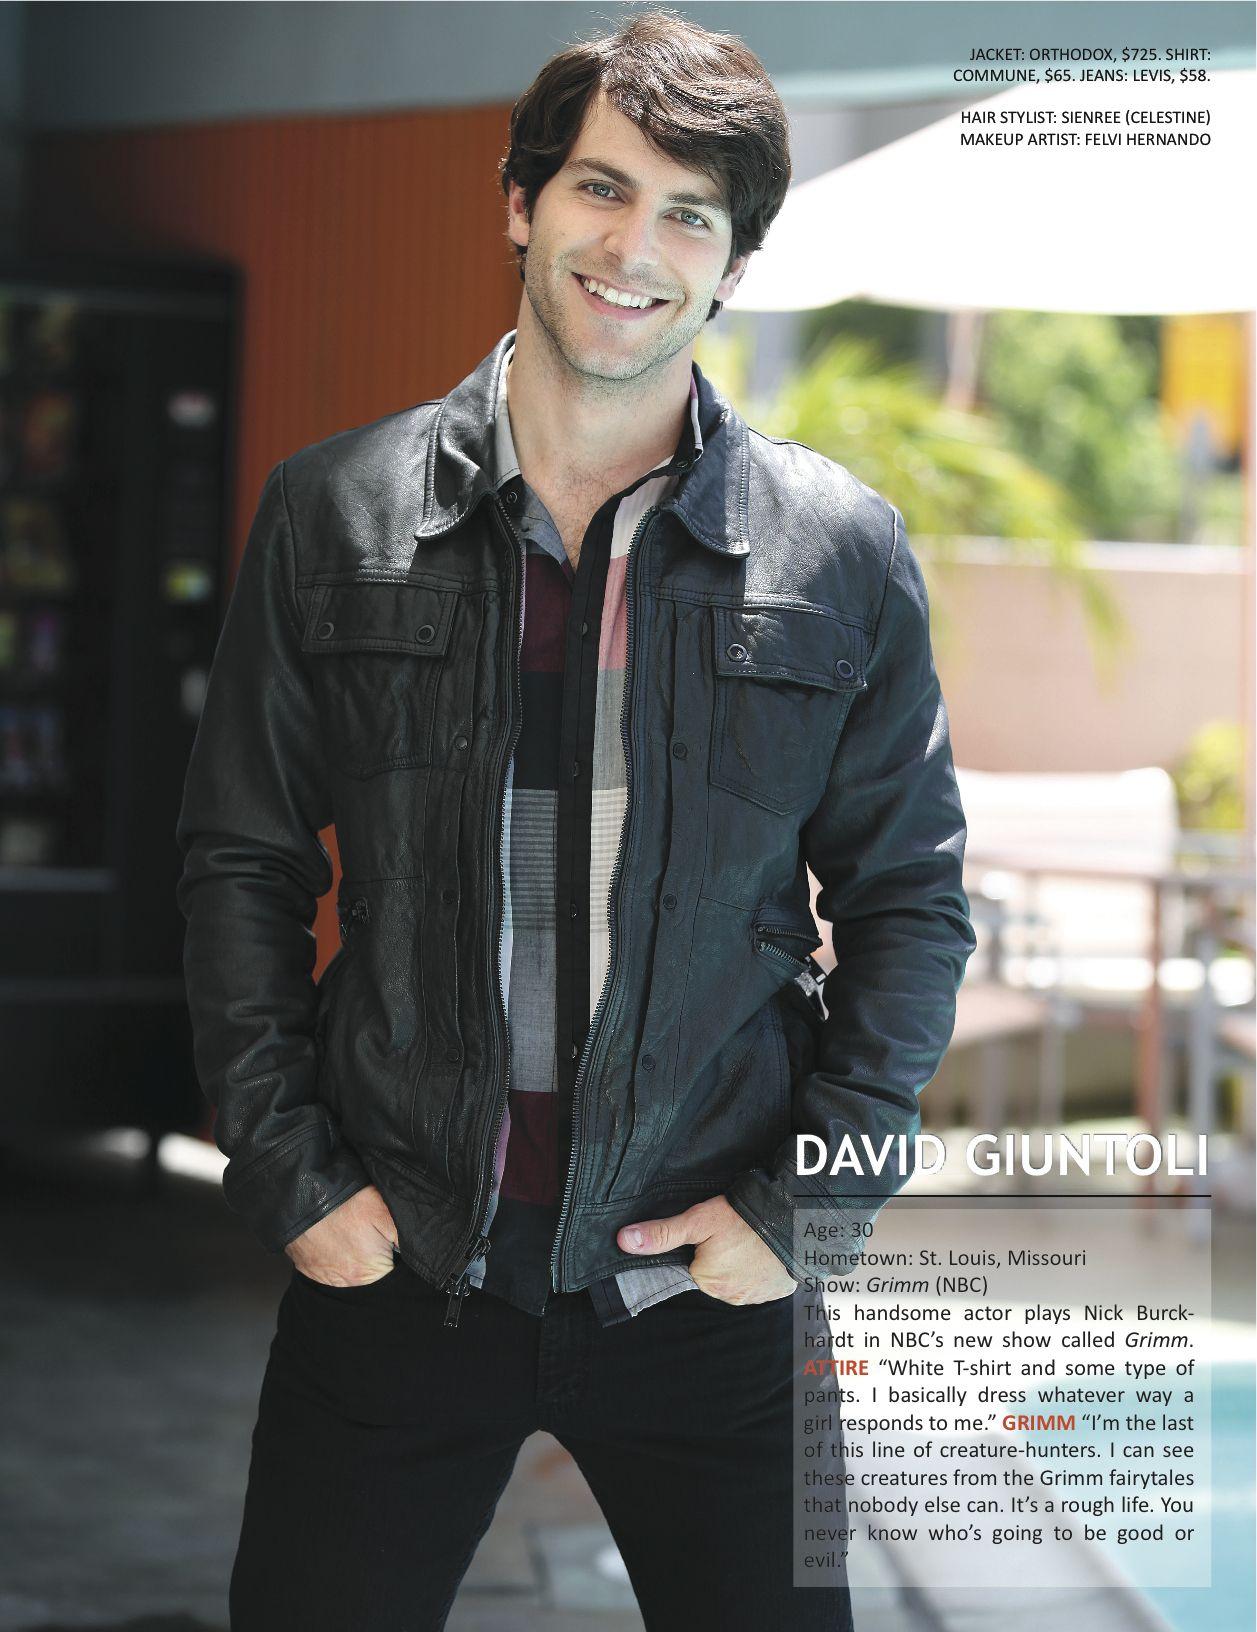 David Giuntoli plays Nick Burkhardt in the NBC Grimm